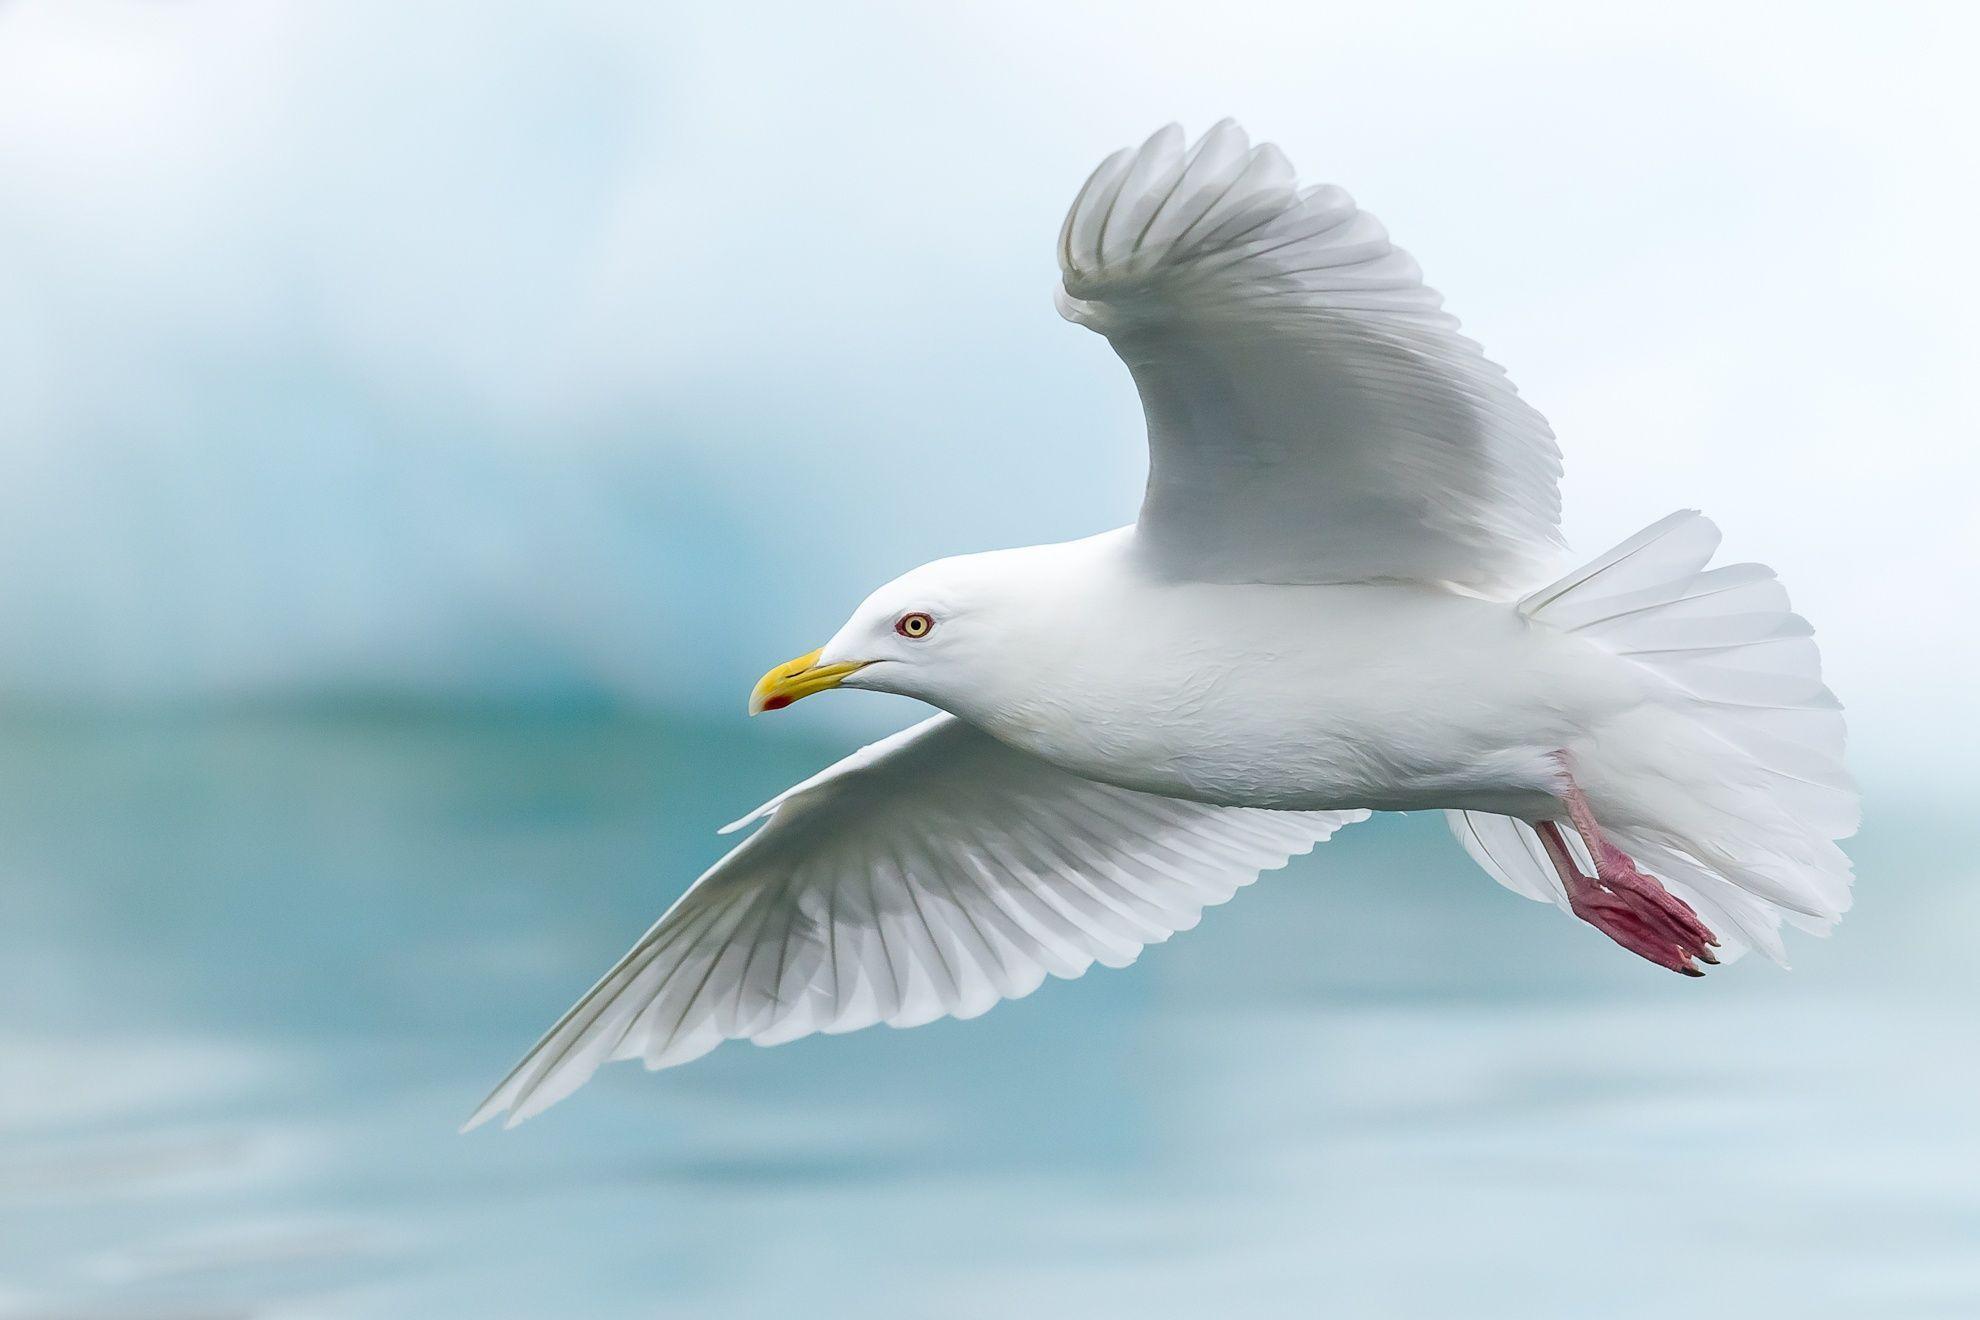 iceland gull larus glaucoides ilulissat greenland